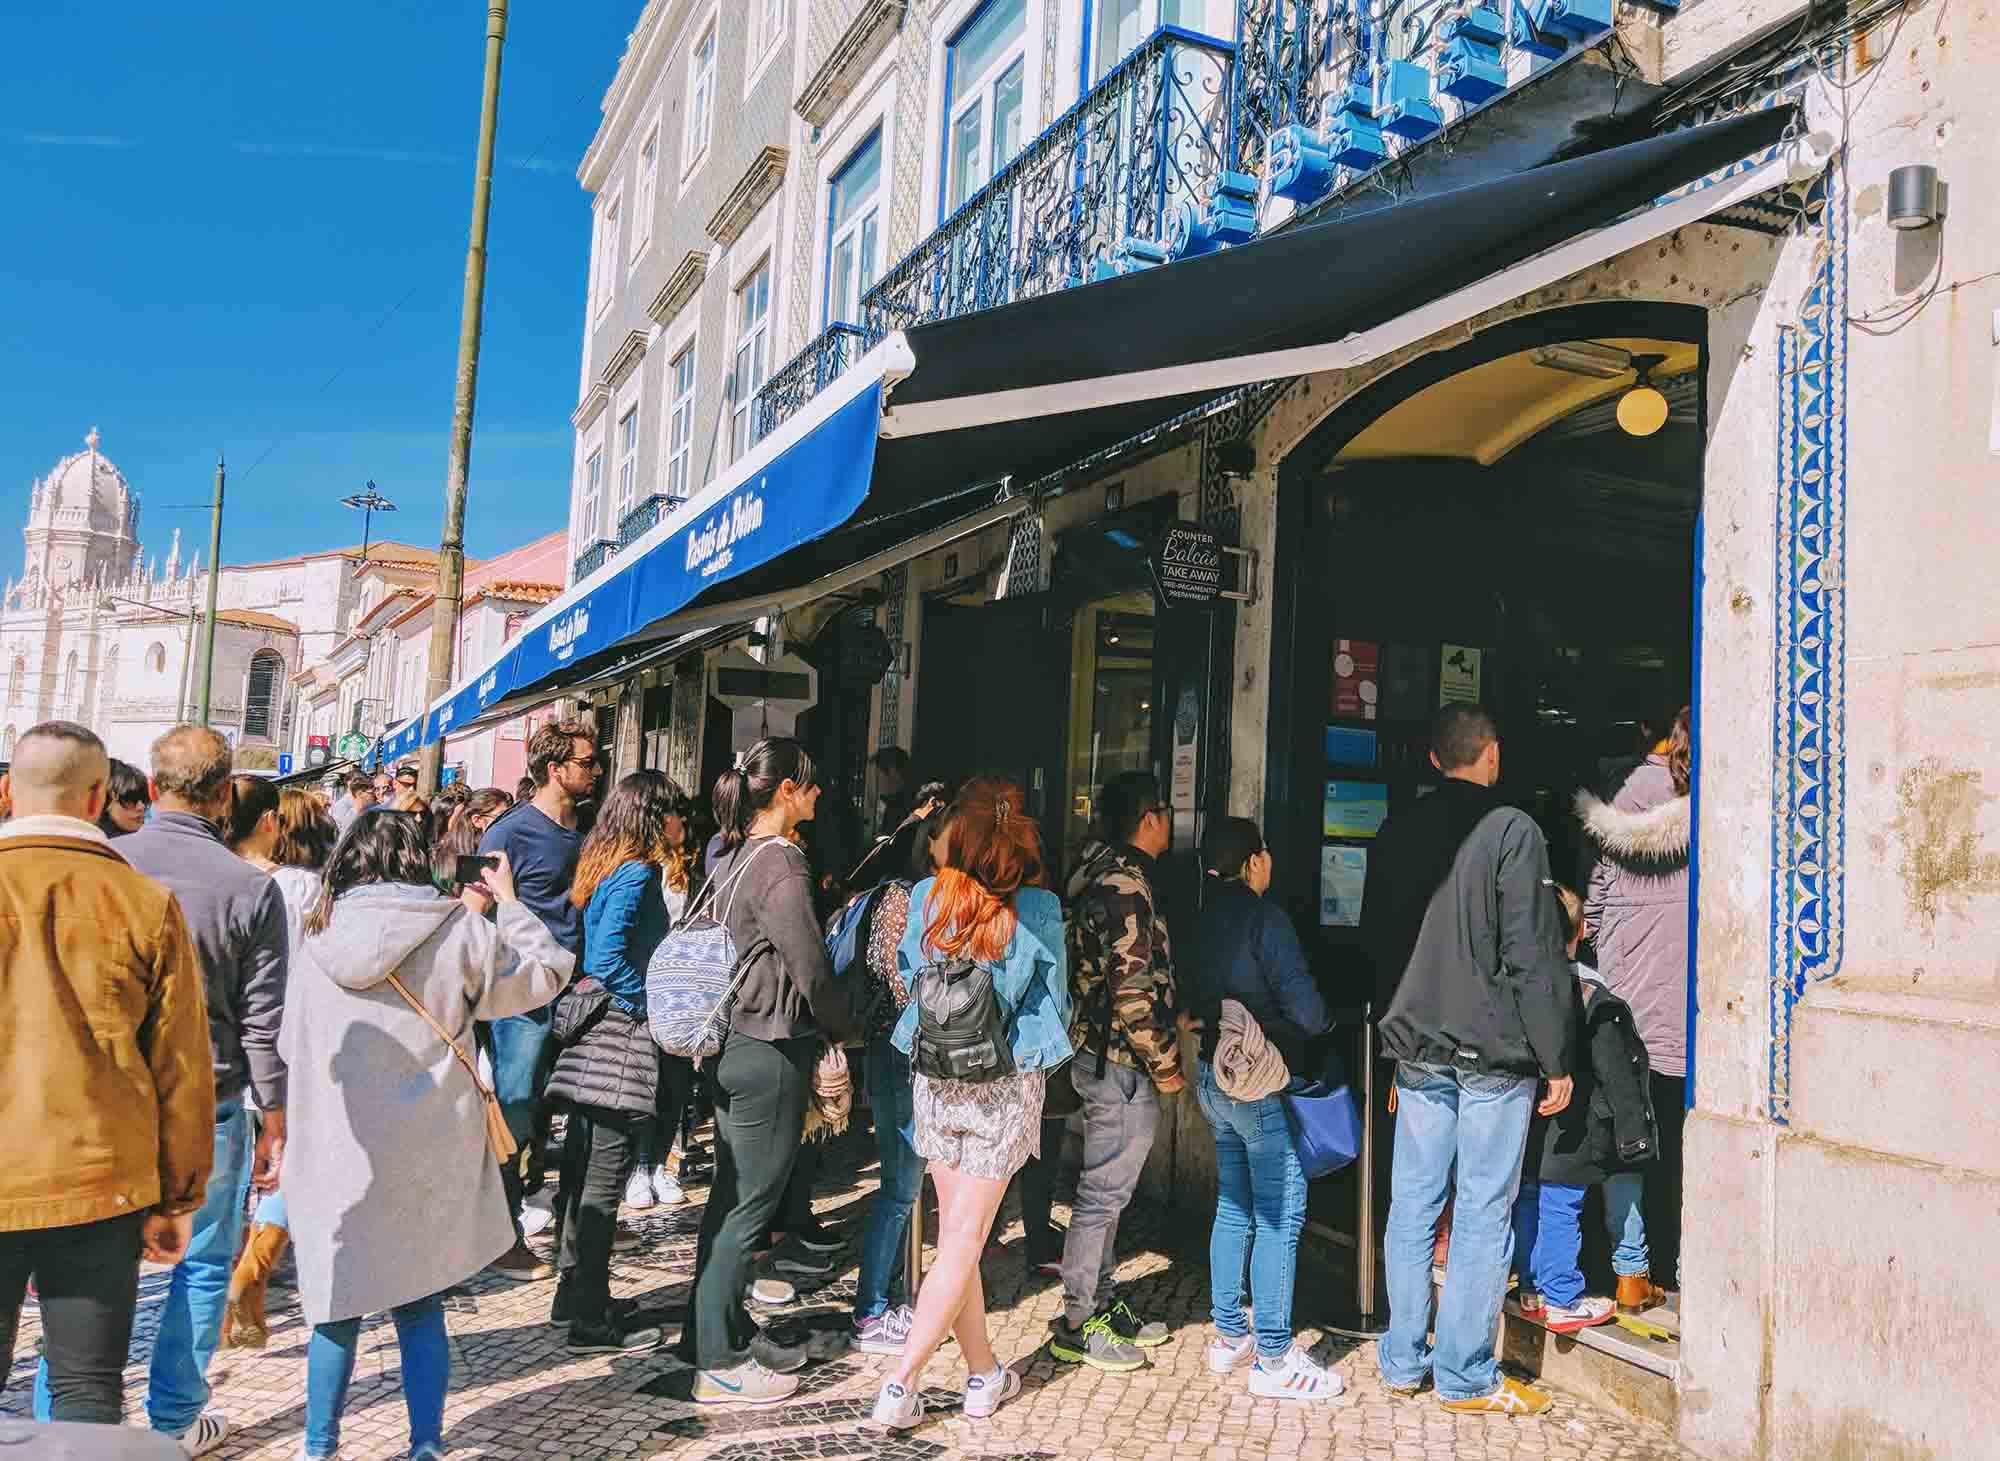 queues at pasteis de belem